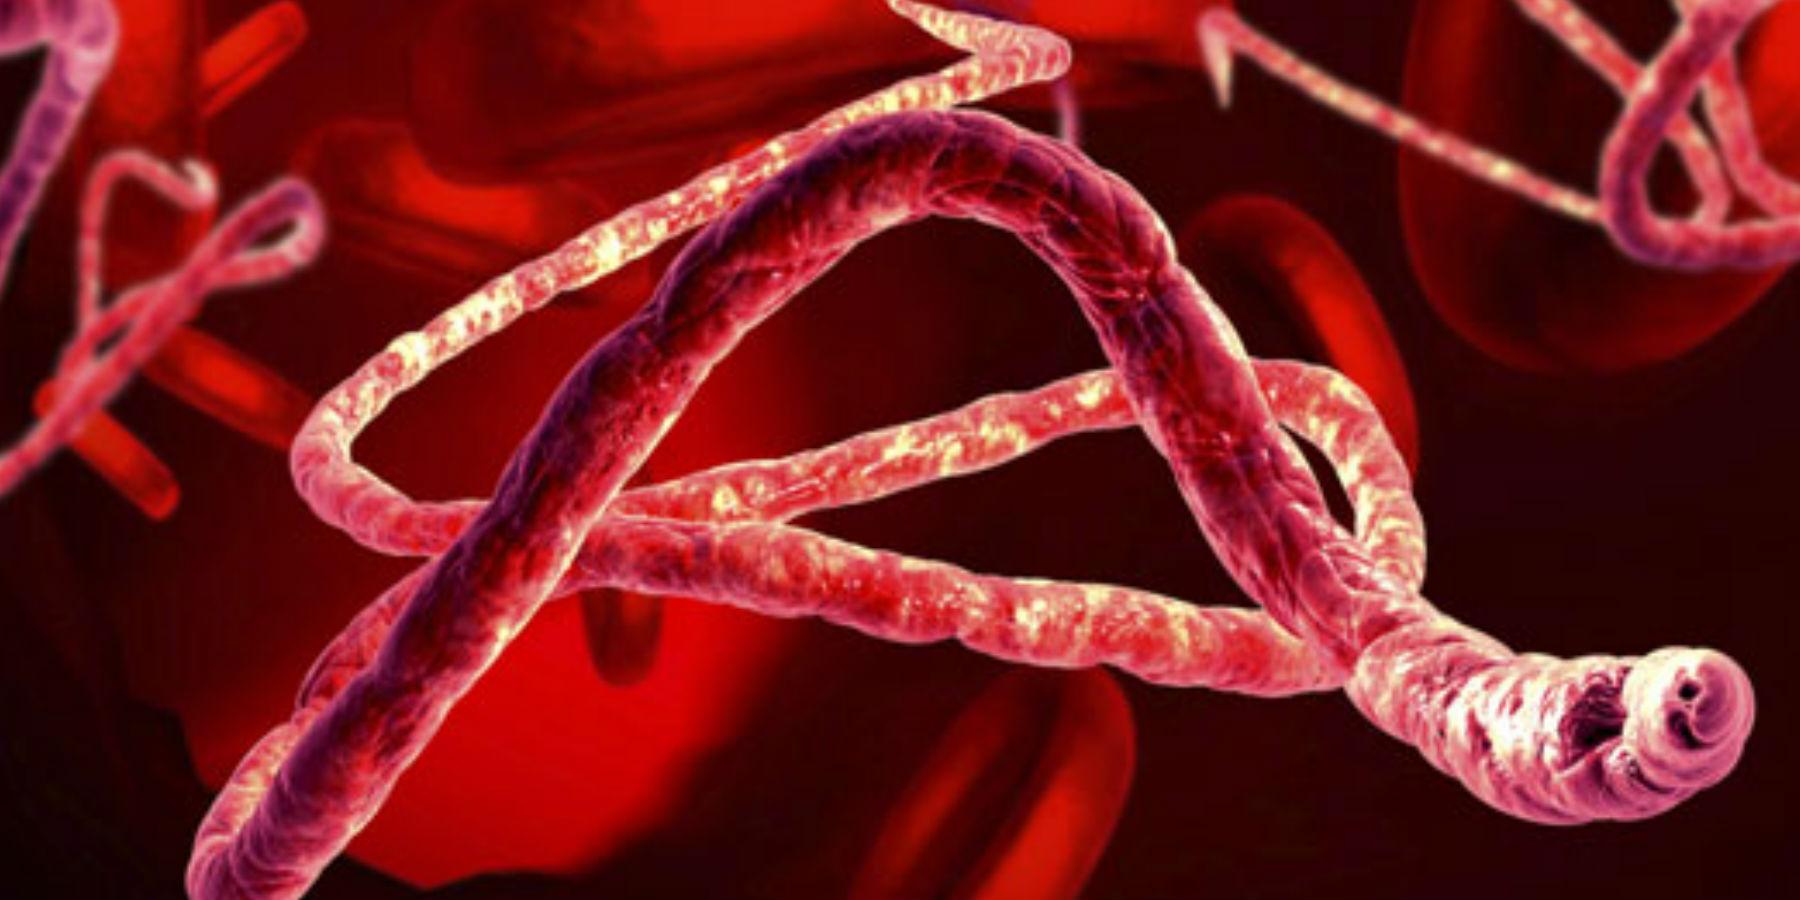 Ebola Outbreak in DRC